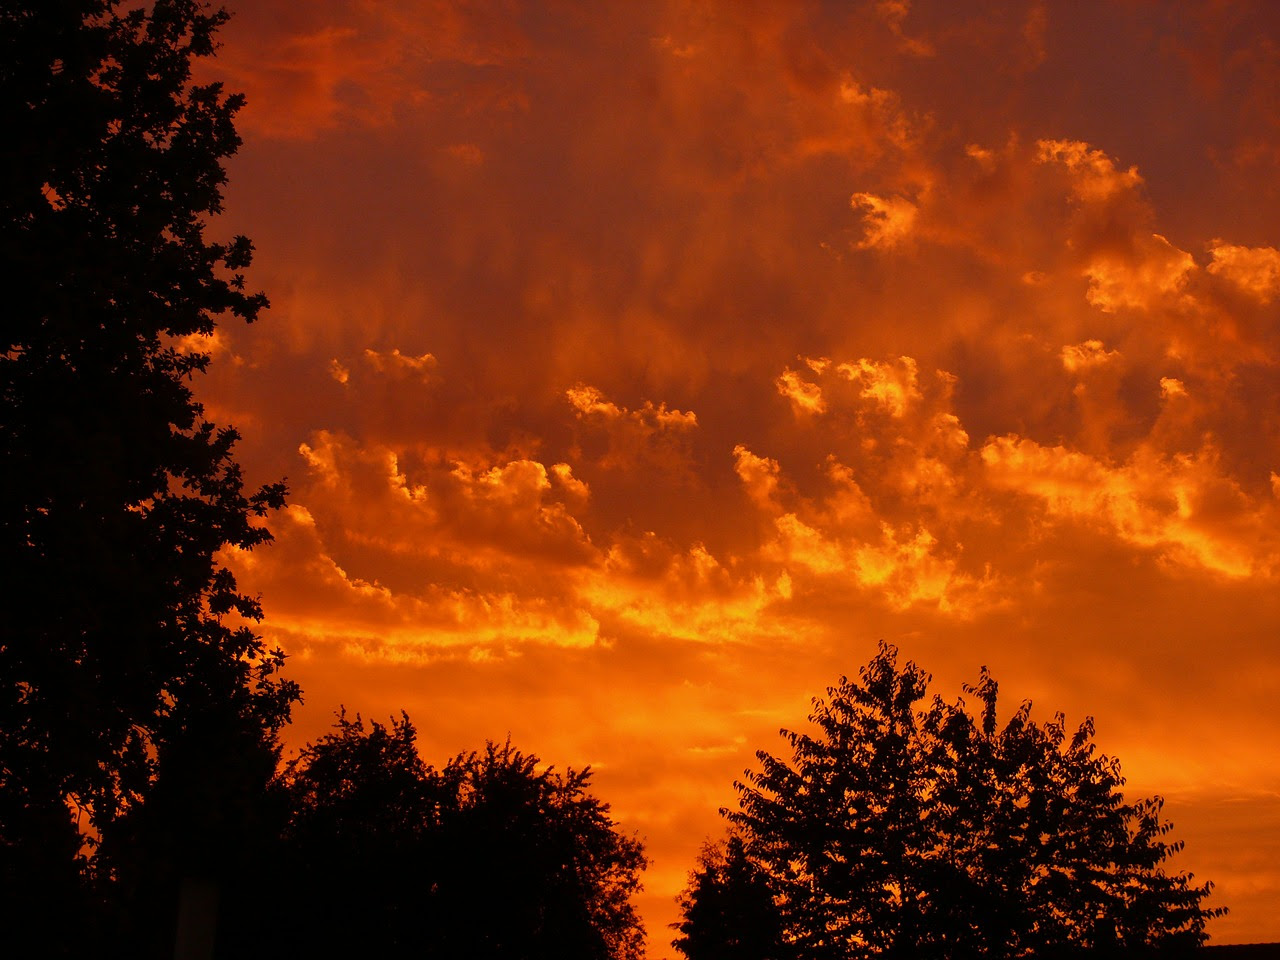 sunset-376071_1280